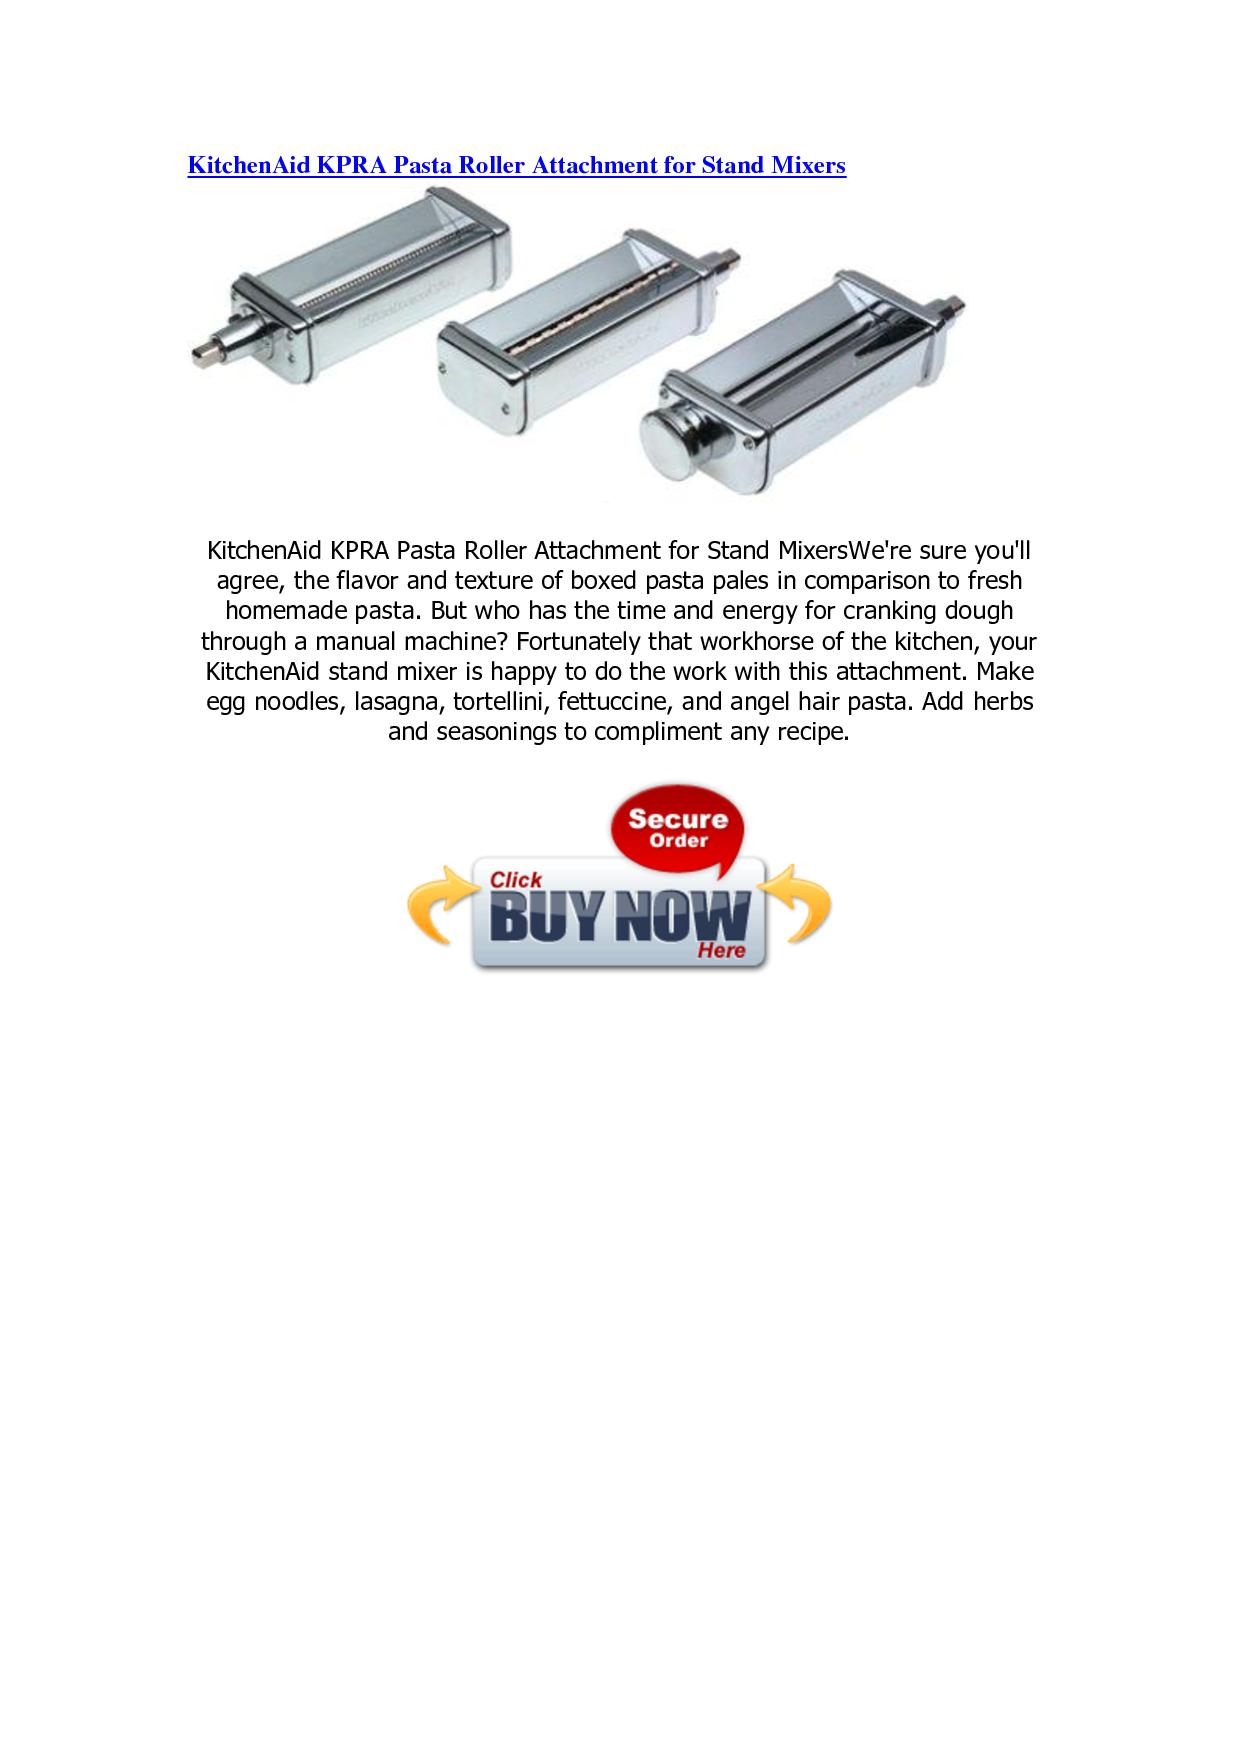 Kitchenaid kpra pasta roller attachment for stand mixers photo - 2